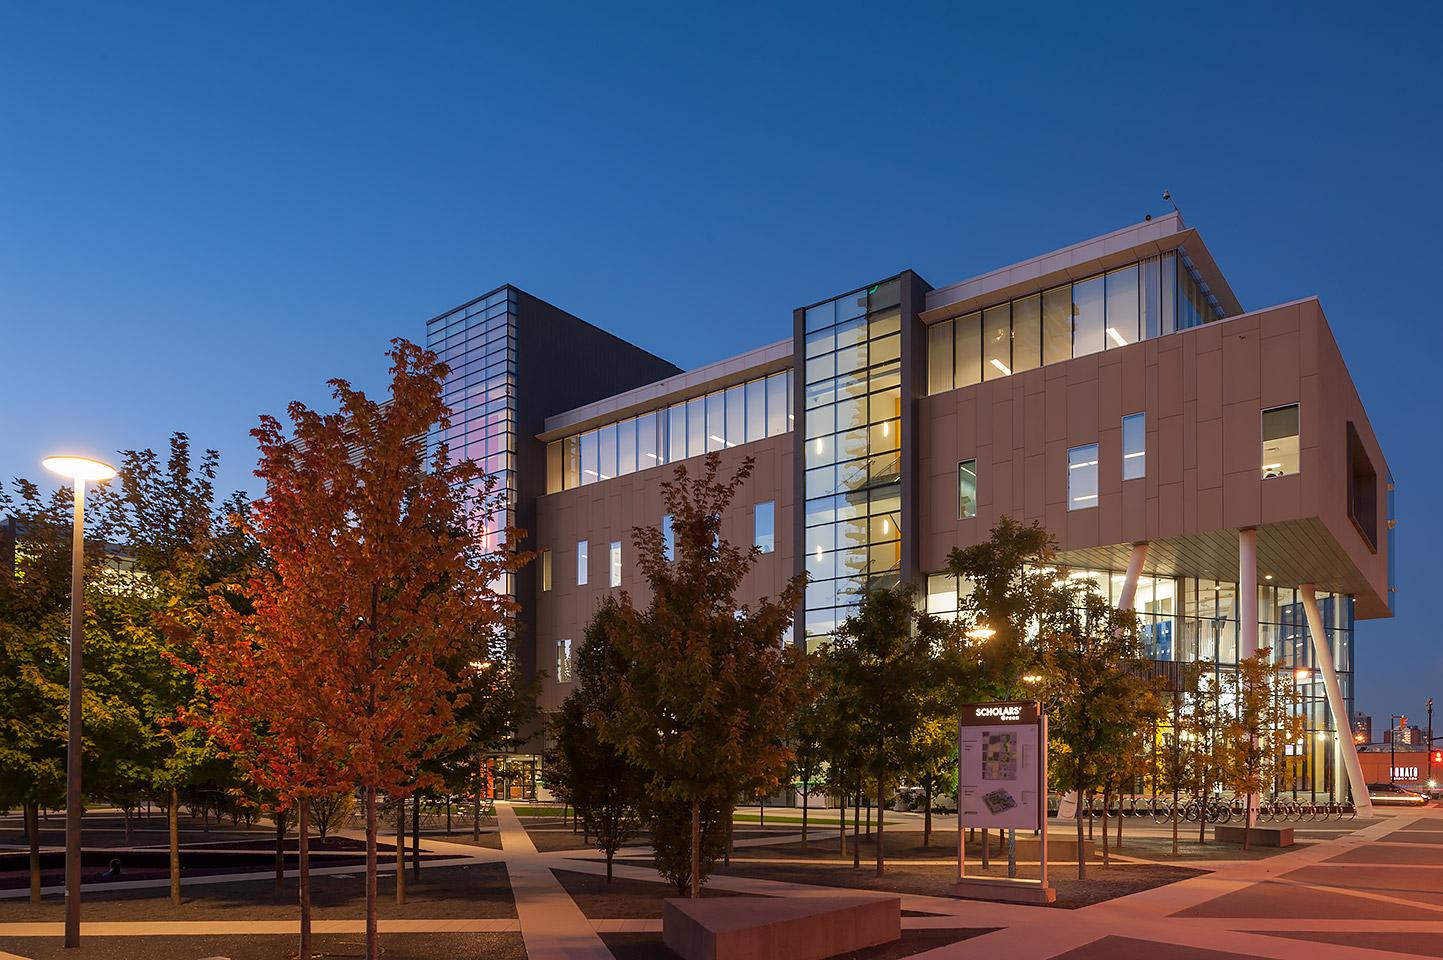 The Sheridan College: Hazel McCallion Campus in Mississauga